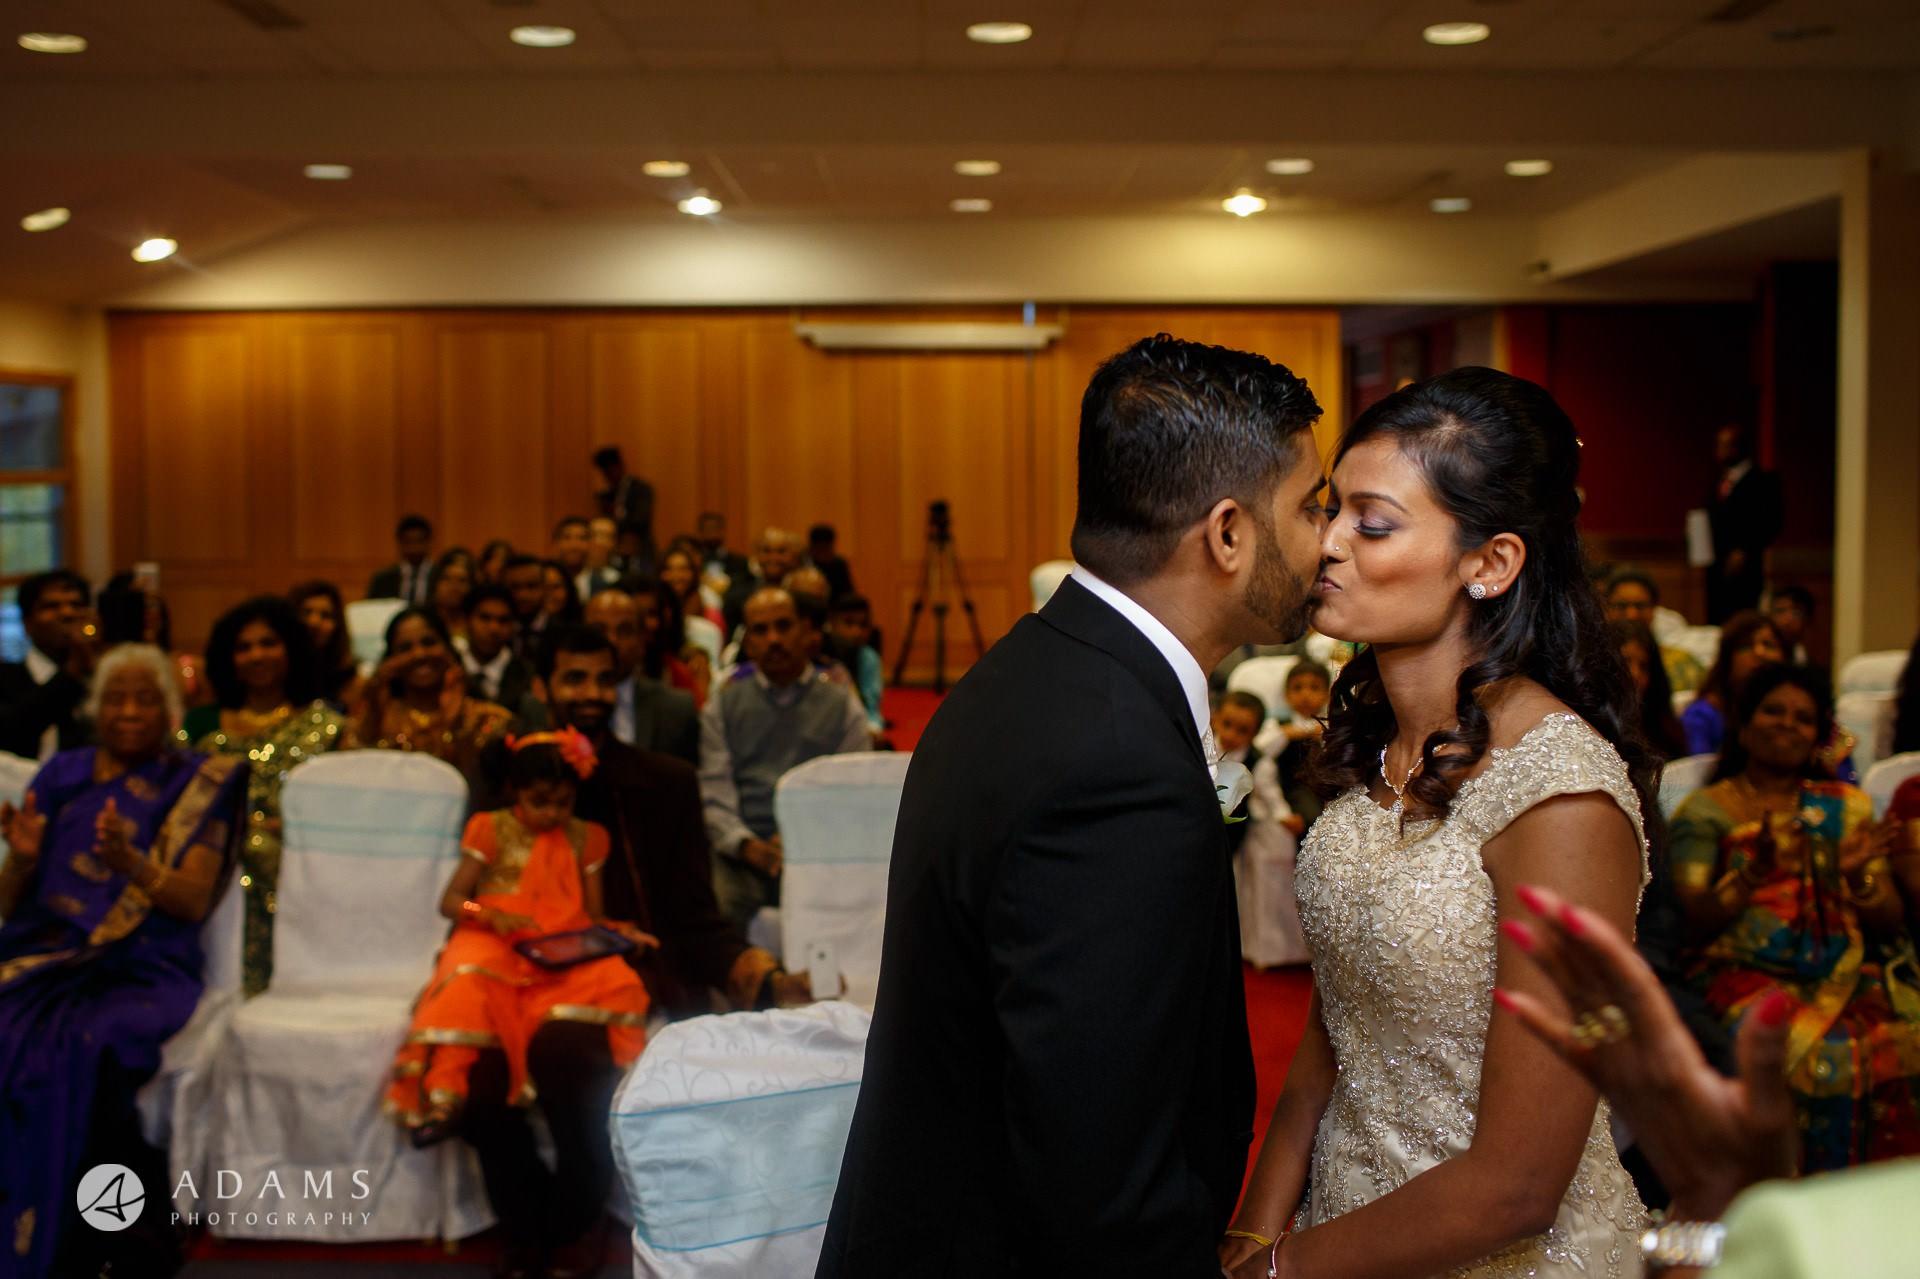 Baylis House Wedding Photographer | Sara + Anojan 16